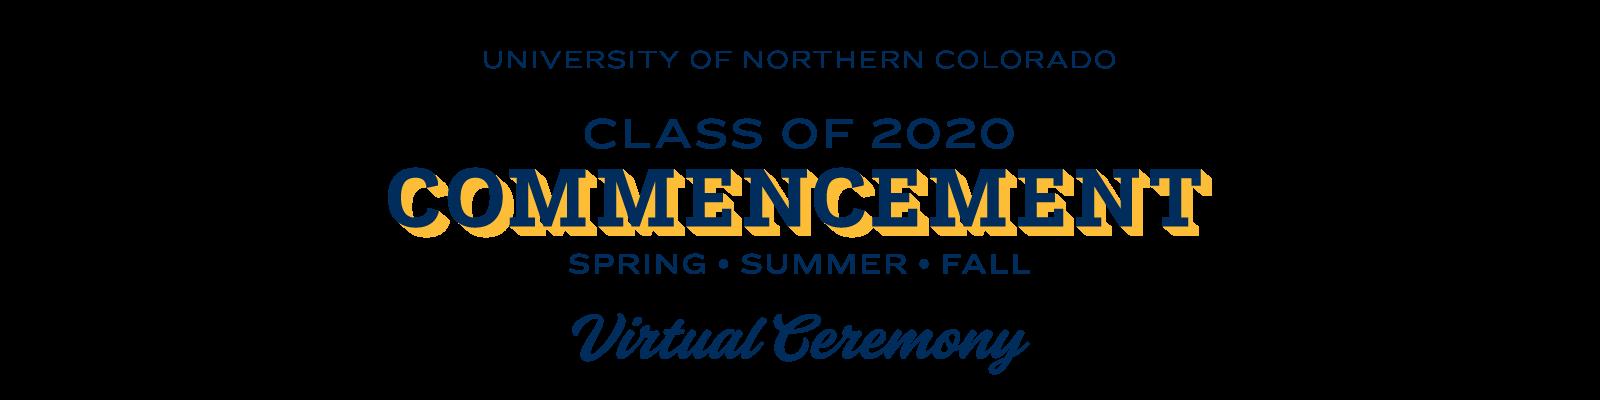 Virtual Commencement 2020